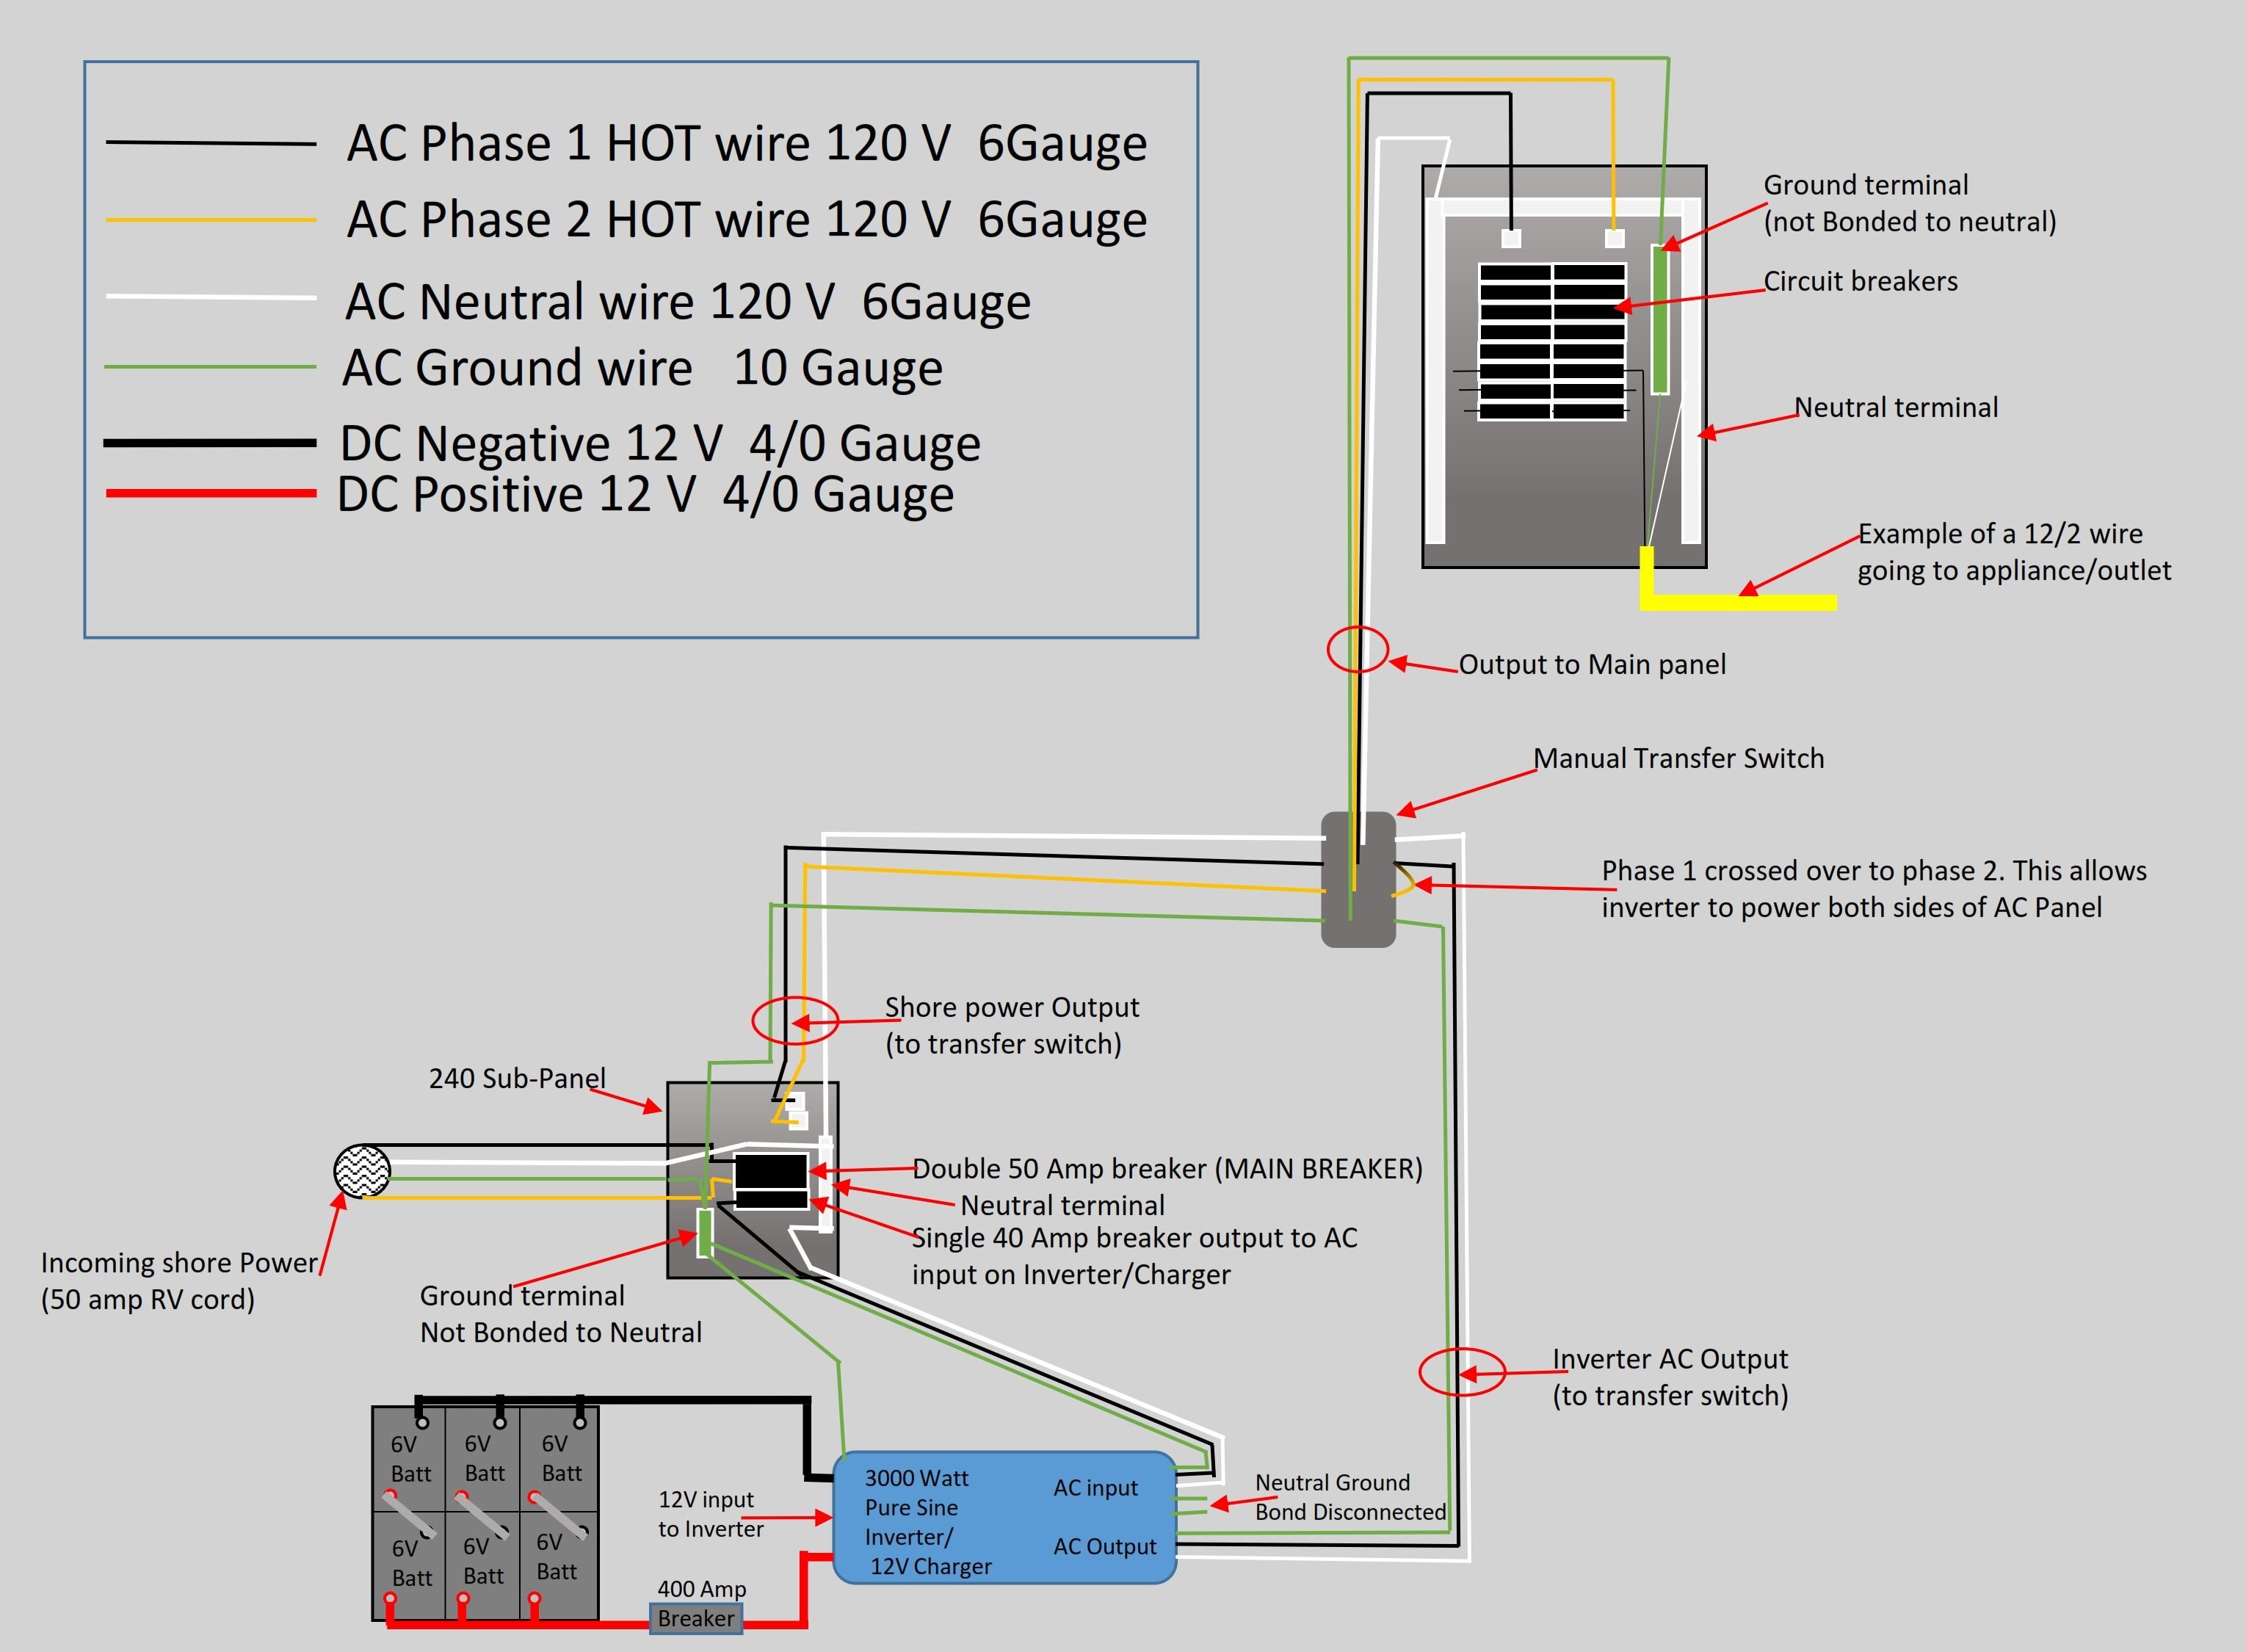 medium resolution of 6 volt generator wiring diagram negative ground wiring library rh 67 codingcommunity de ford 8n 6 volt wiring diagram to 20 ferguson tractor wiring diagram